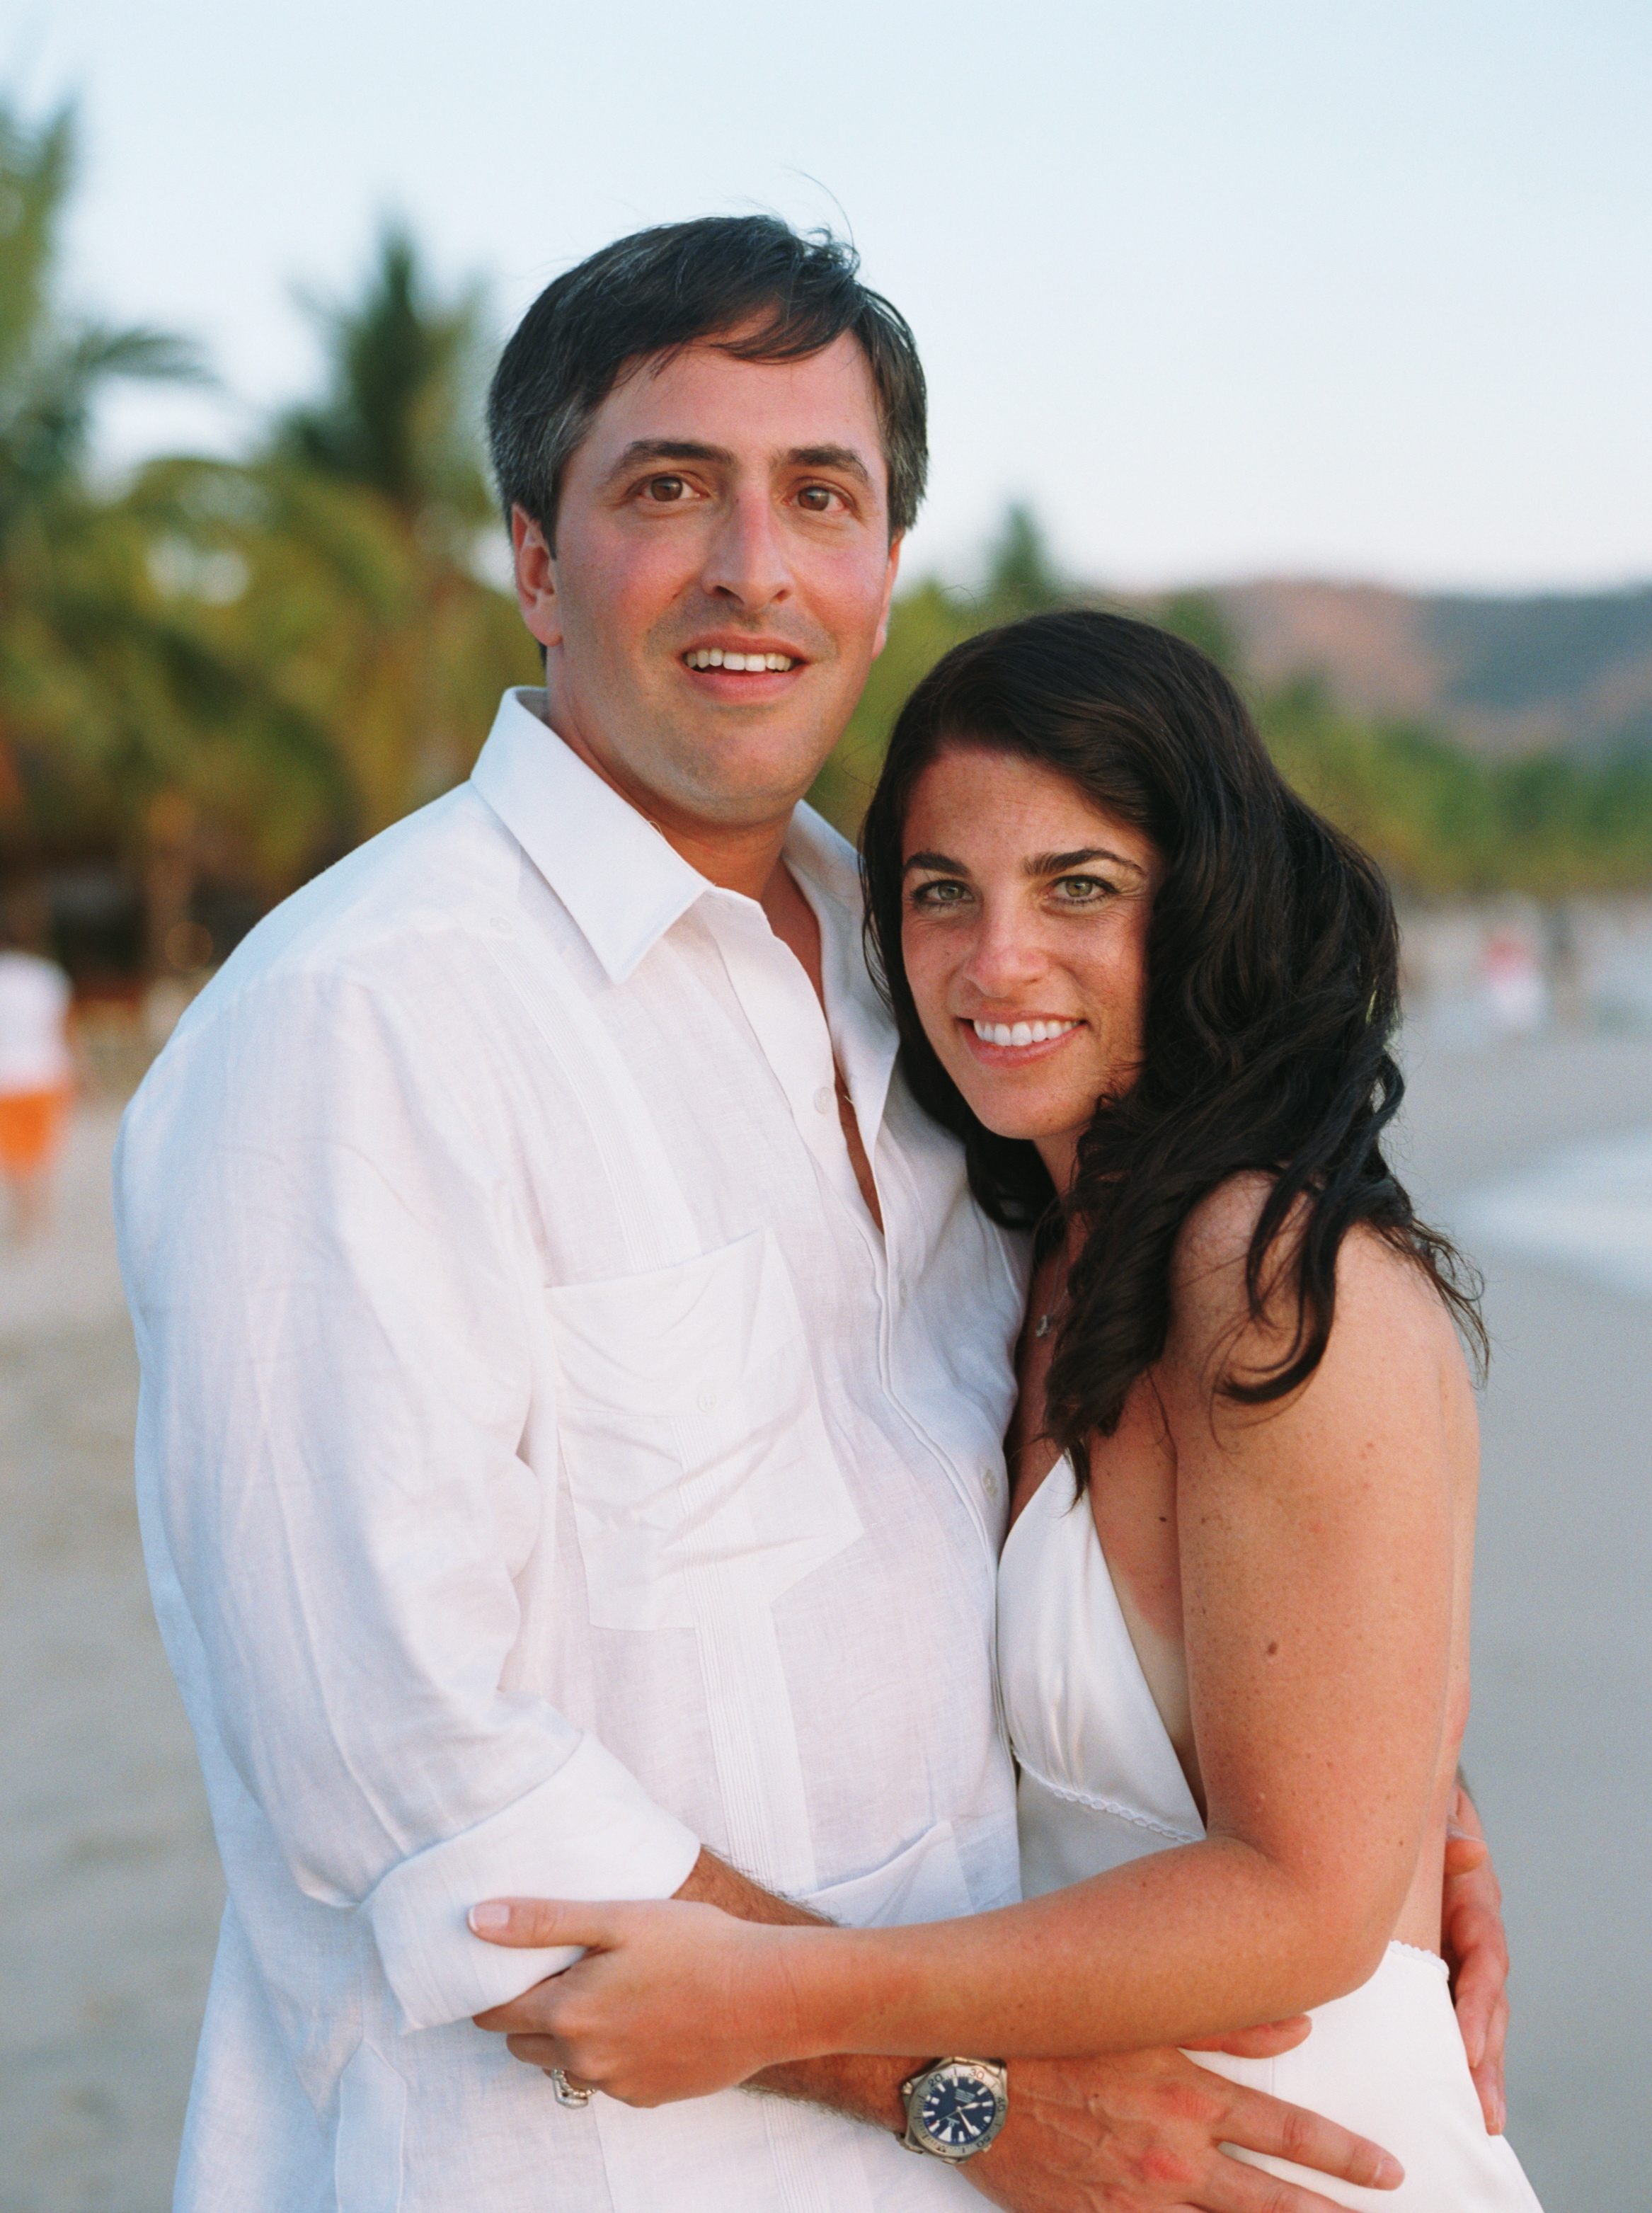 Destinations, yellow, blue, Destination Weddings, Mexico, Beach Weddings, Wedding, Nautical, Navy, Mexico weddings